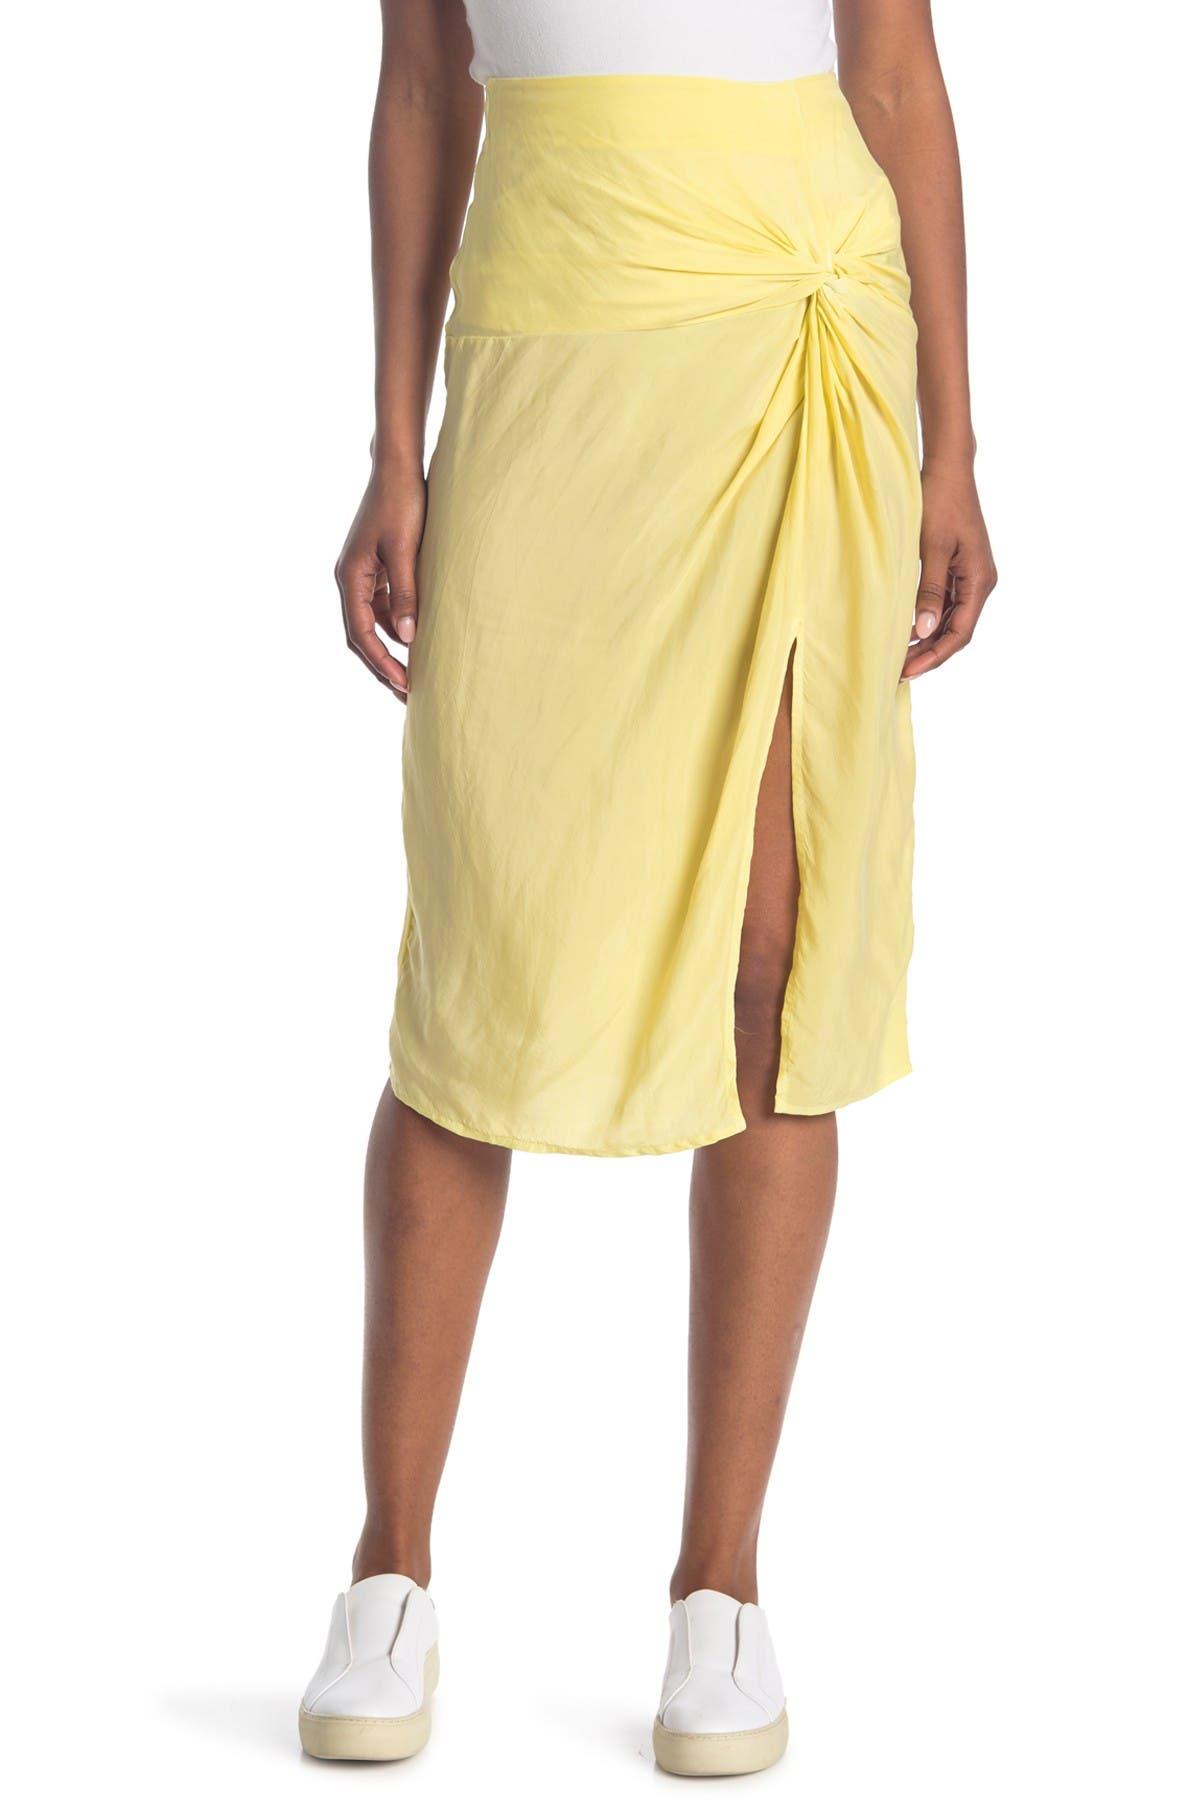 Image of Stateside Cupro Twist Front Skirt